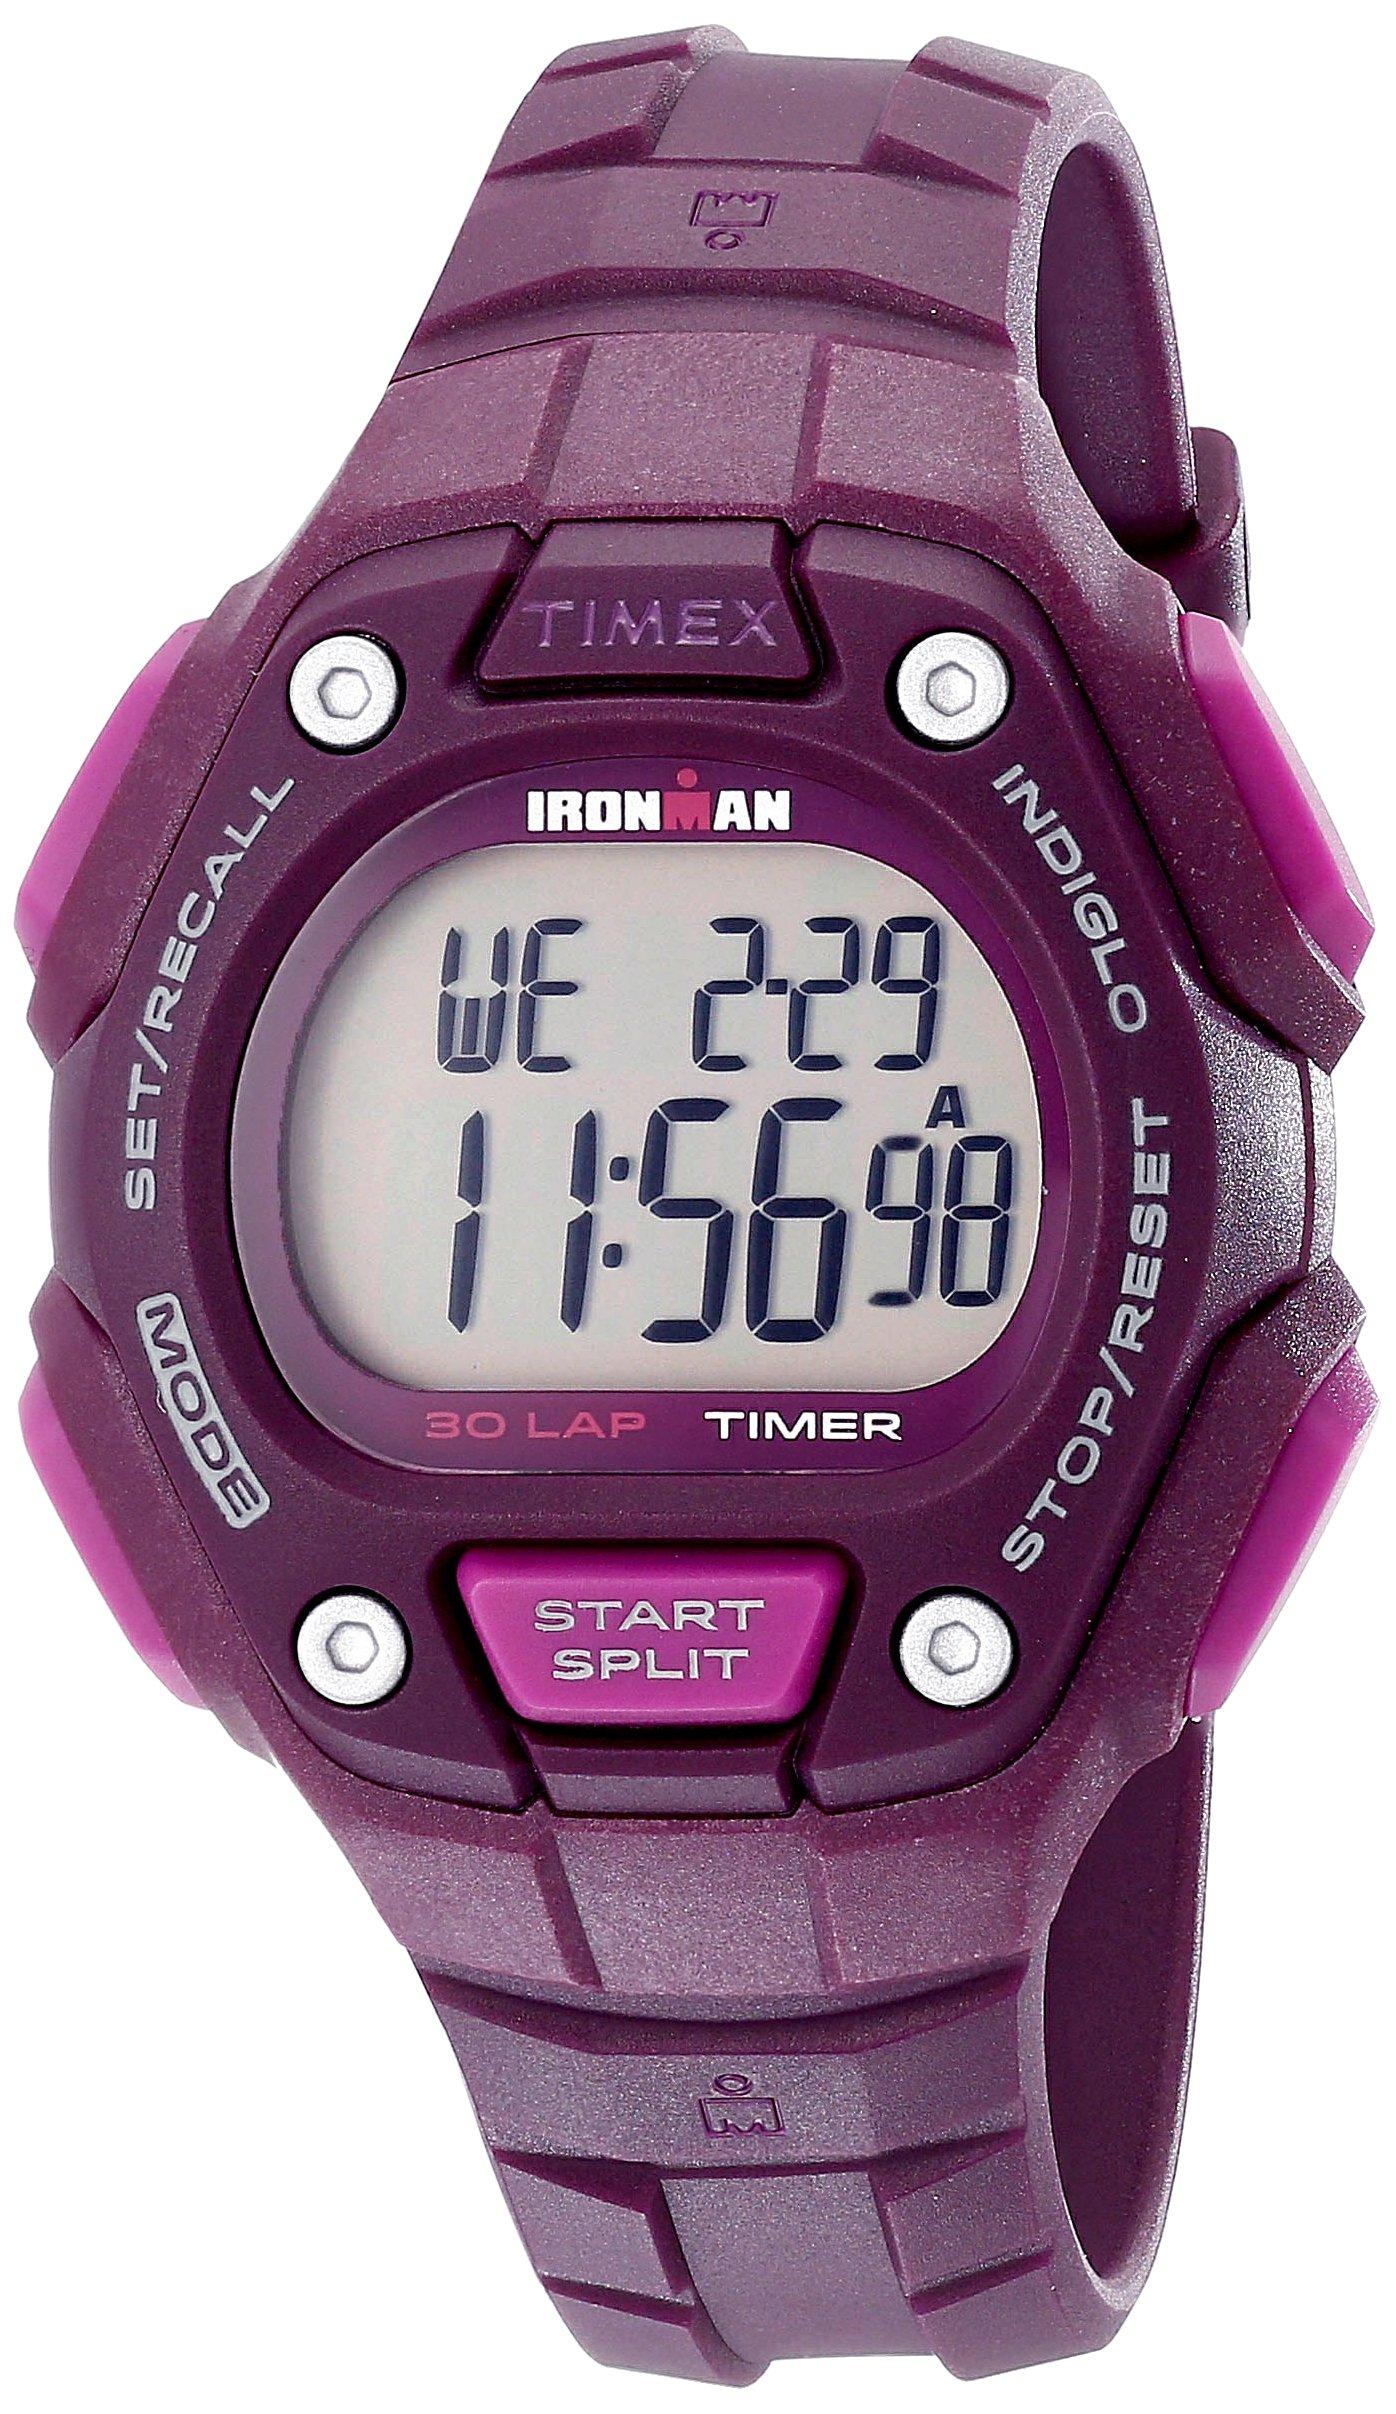 Timex Women's Ironman 30-Lap Digital Quartz Mid-Size Watch, Plum - TW5K89700 by Timex (Image #1)